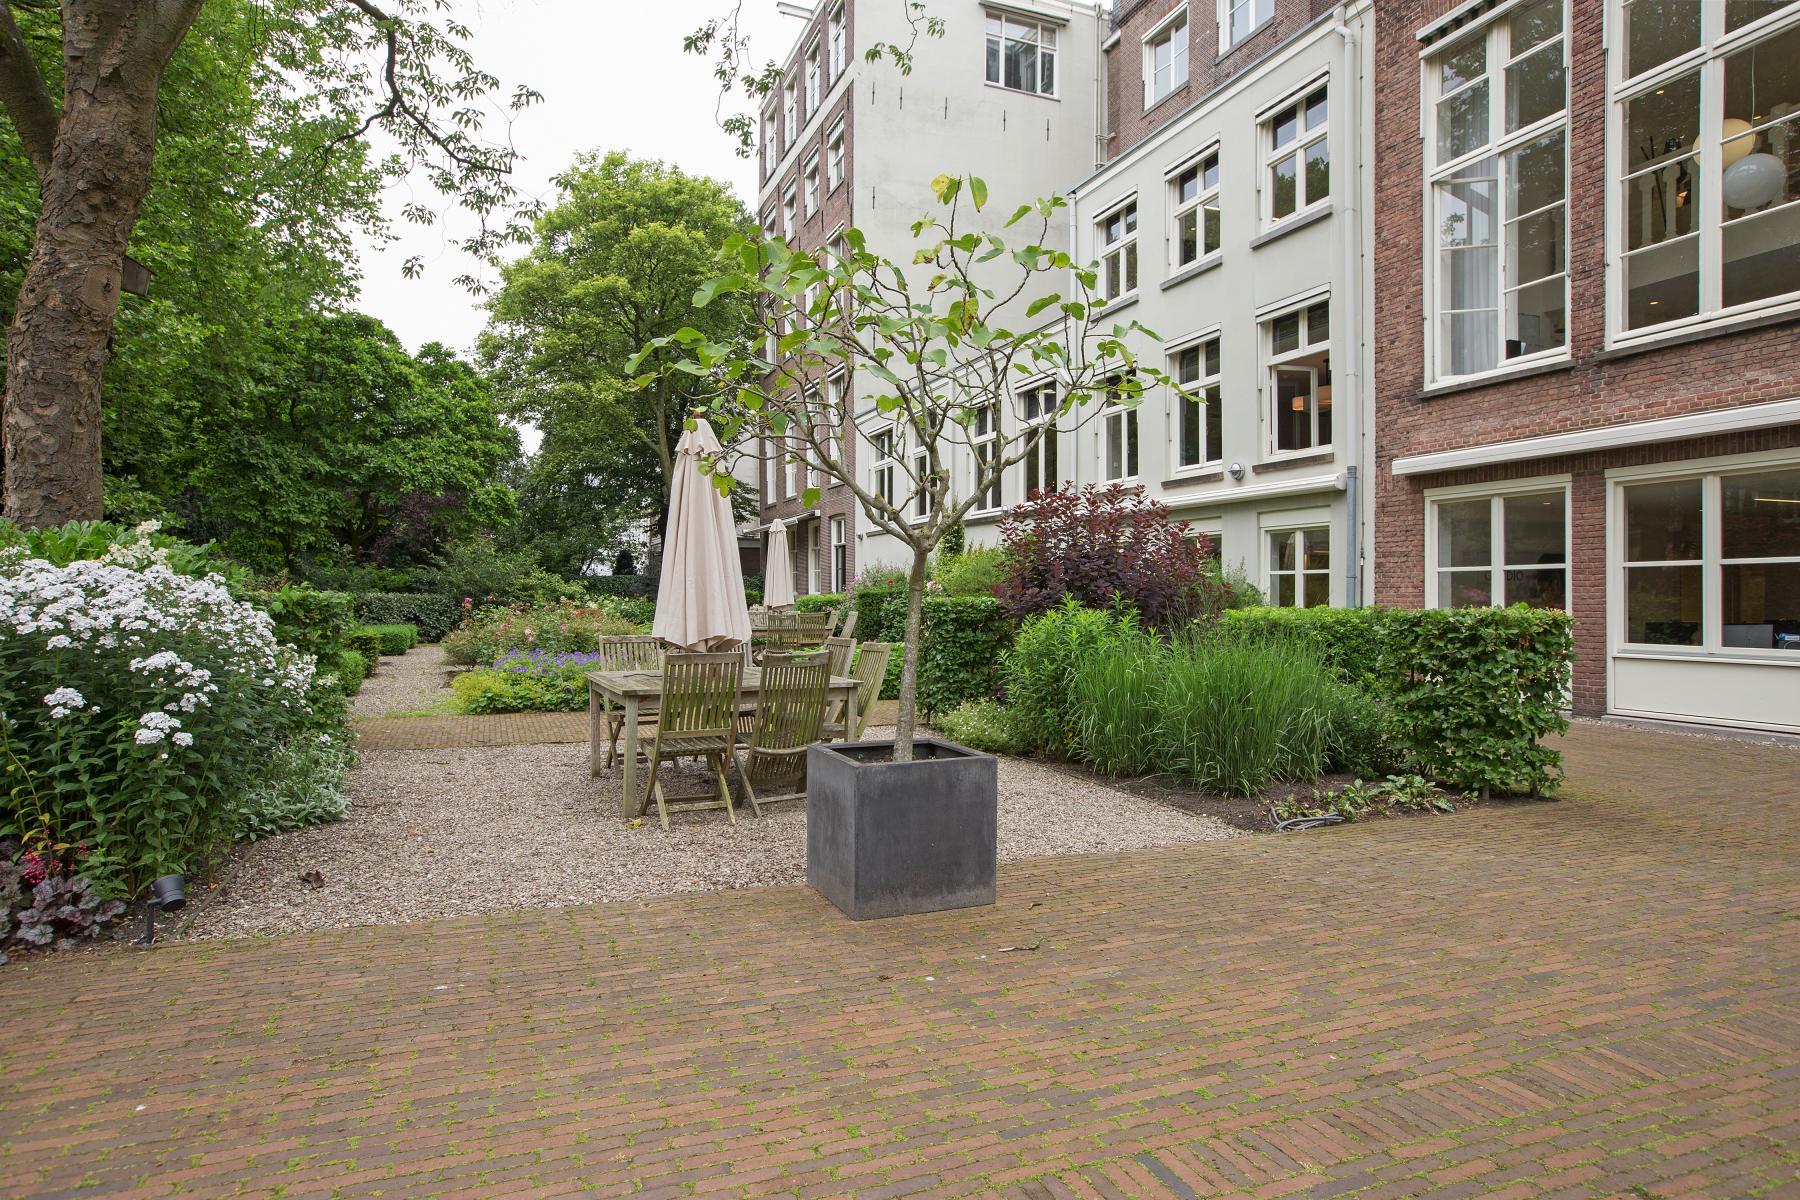 terras amsterdam herengracht kantoorpand huren tuin skepp